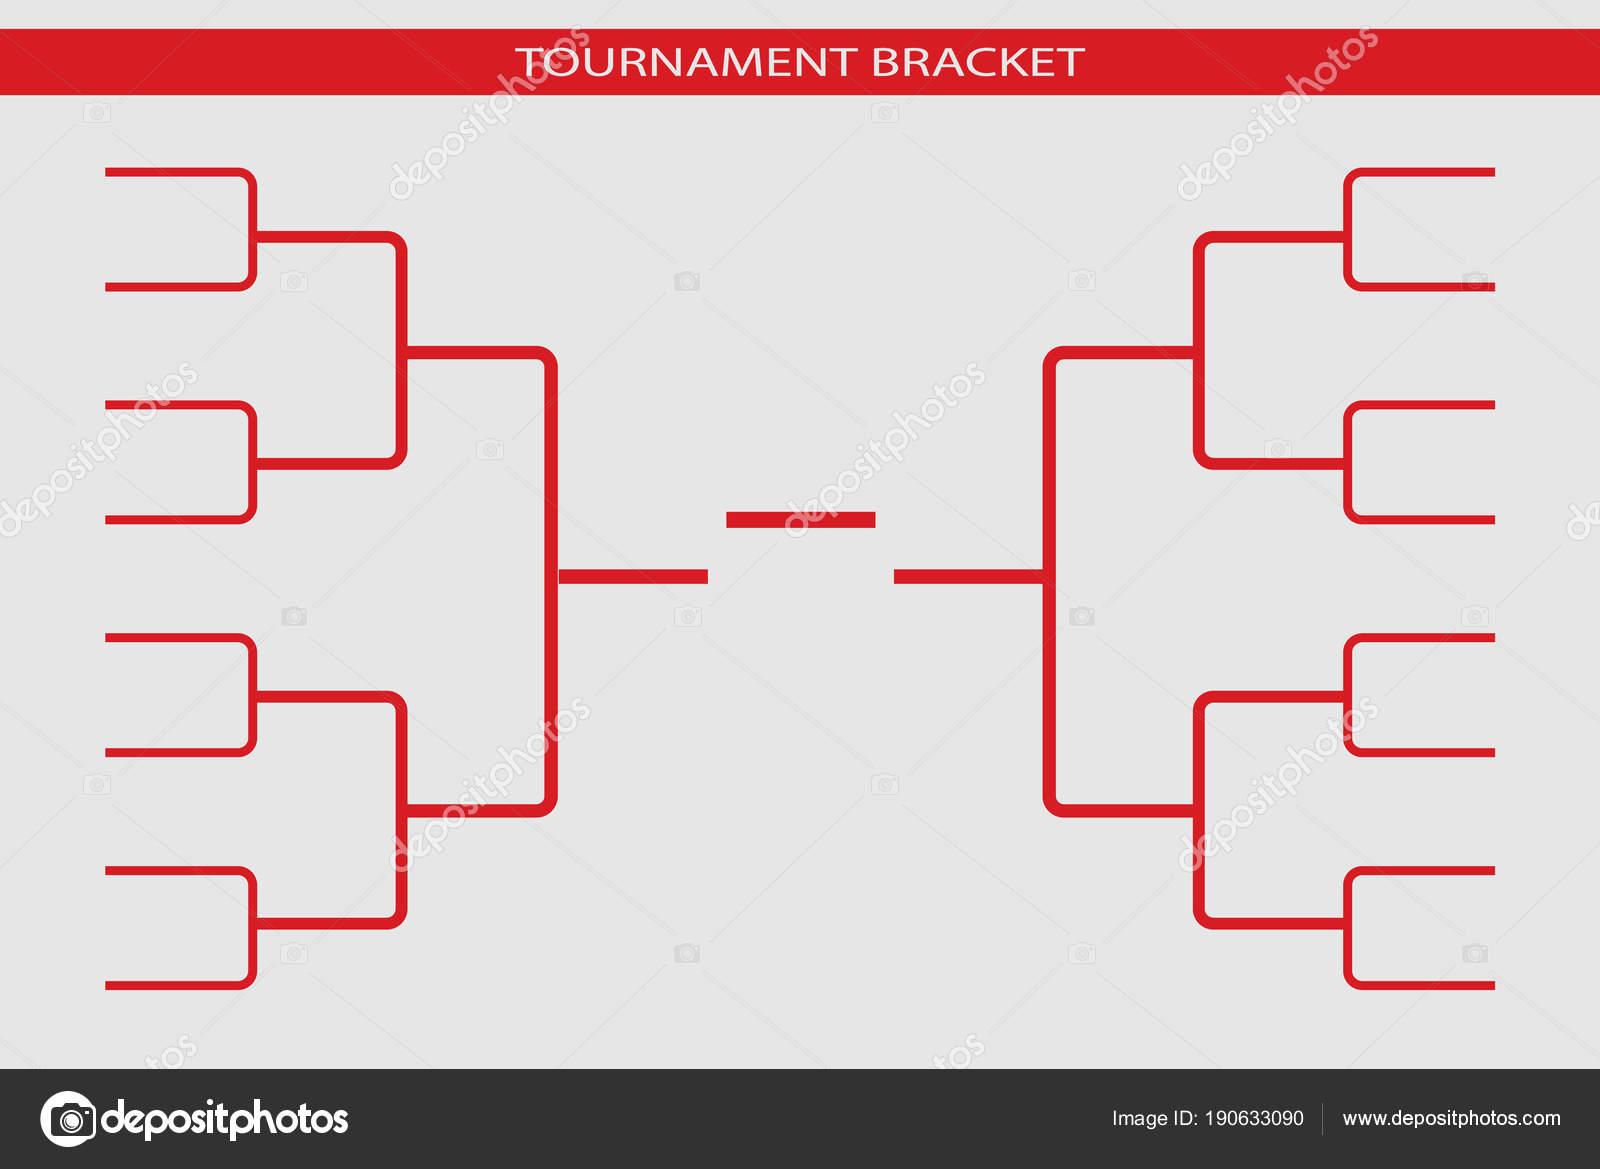 Tournament bracket vector championship template stock photo tournament bracket vector championship template photo by vectoreps10 maxwellsz